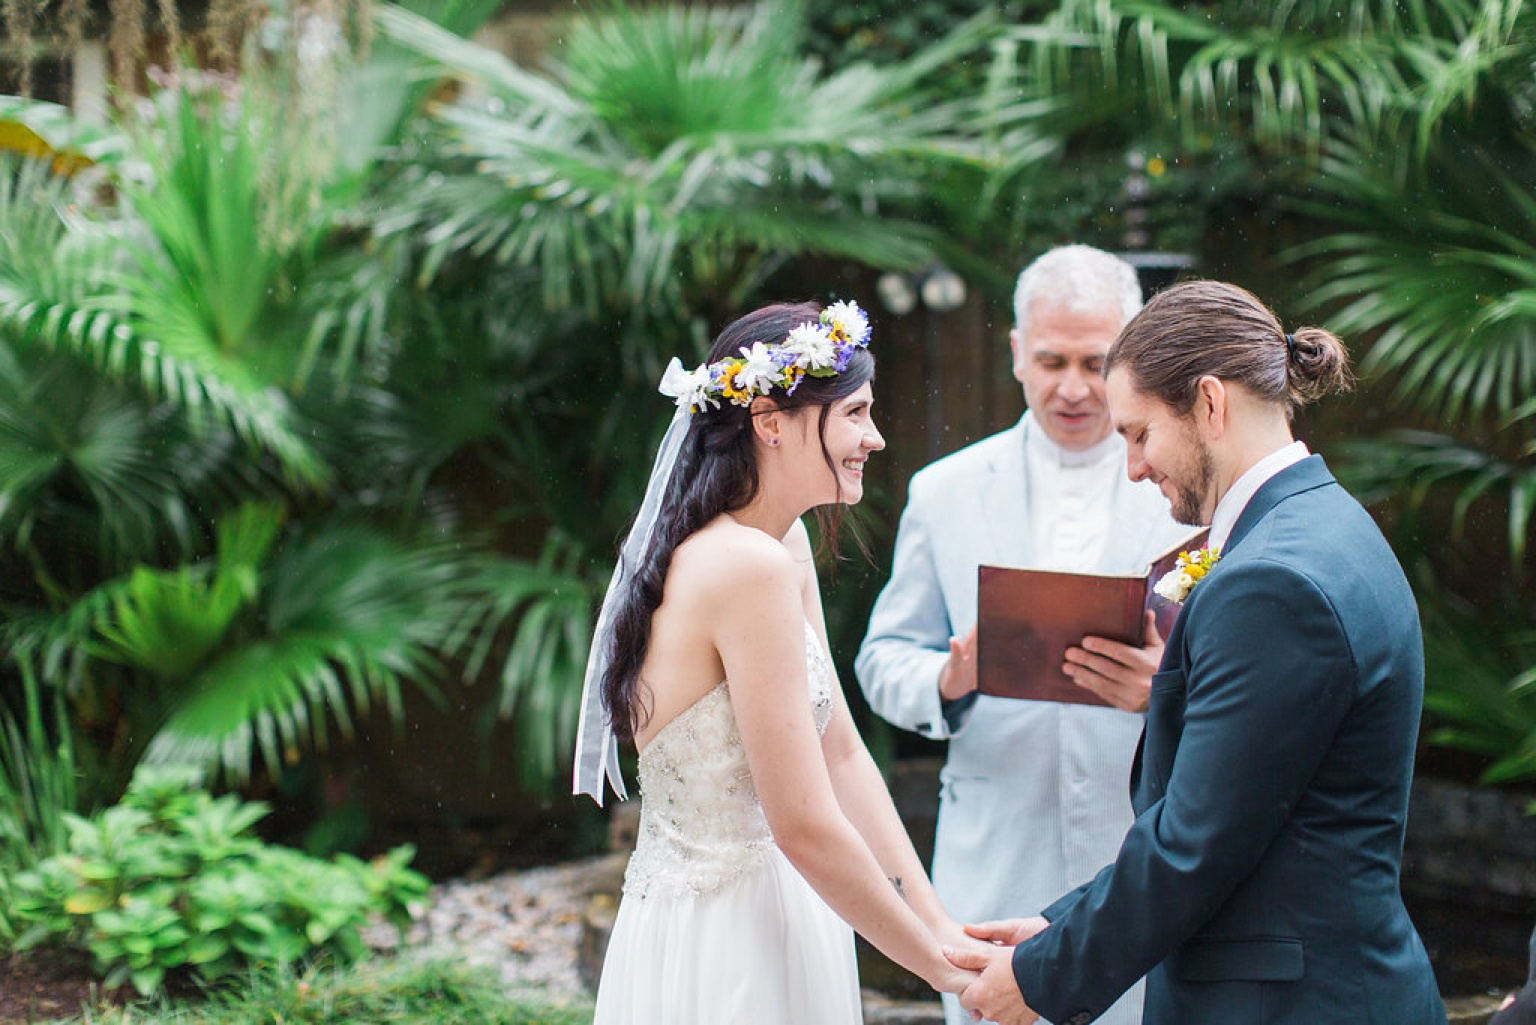 Apt_B_Photo_Savannah_Wedding_Photographer_Flower_Crown030.JPG